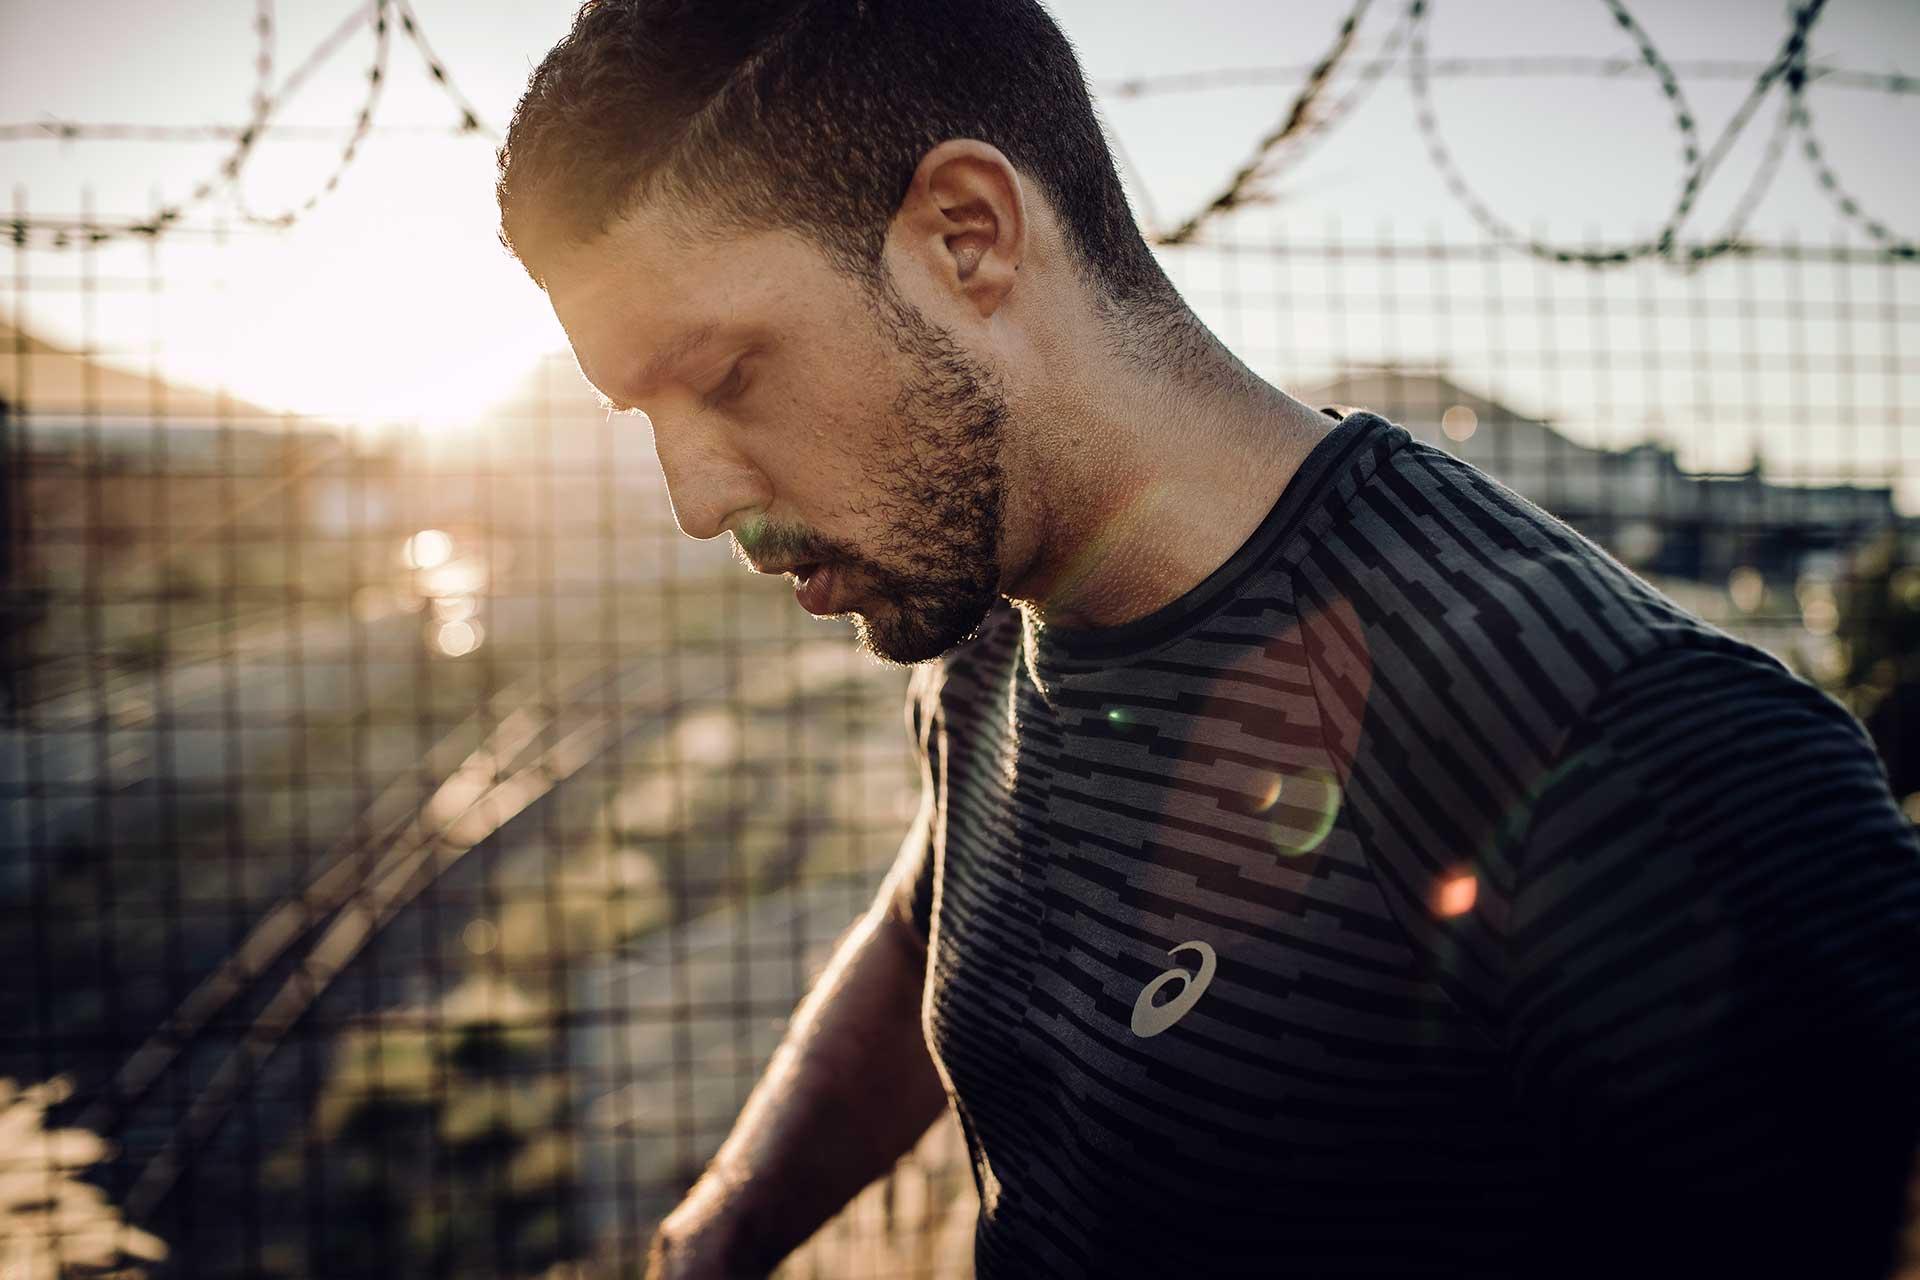 Portrait Sport Laufen Running Fitness Ausdauer London England